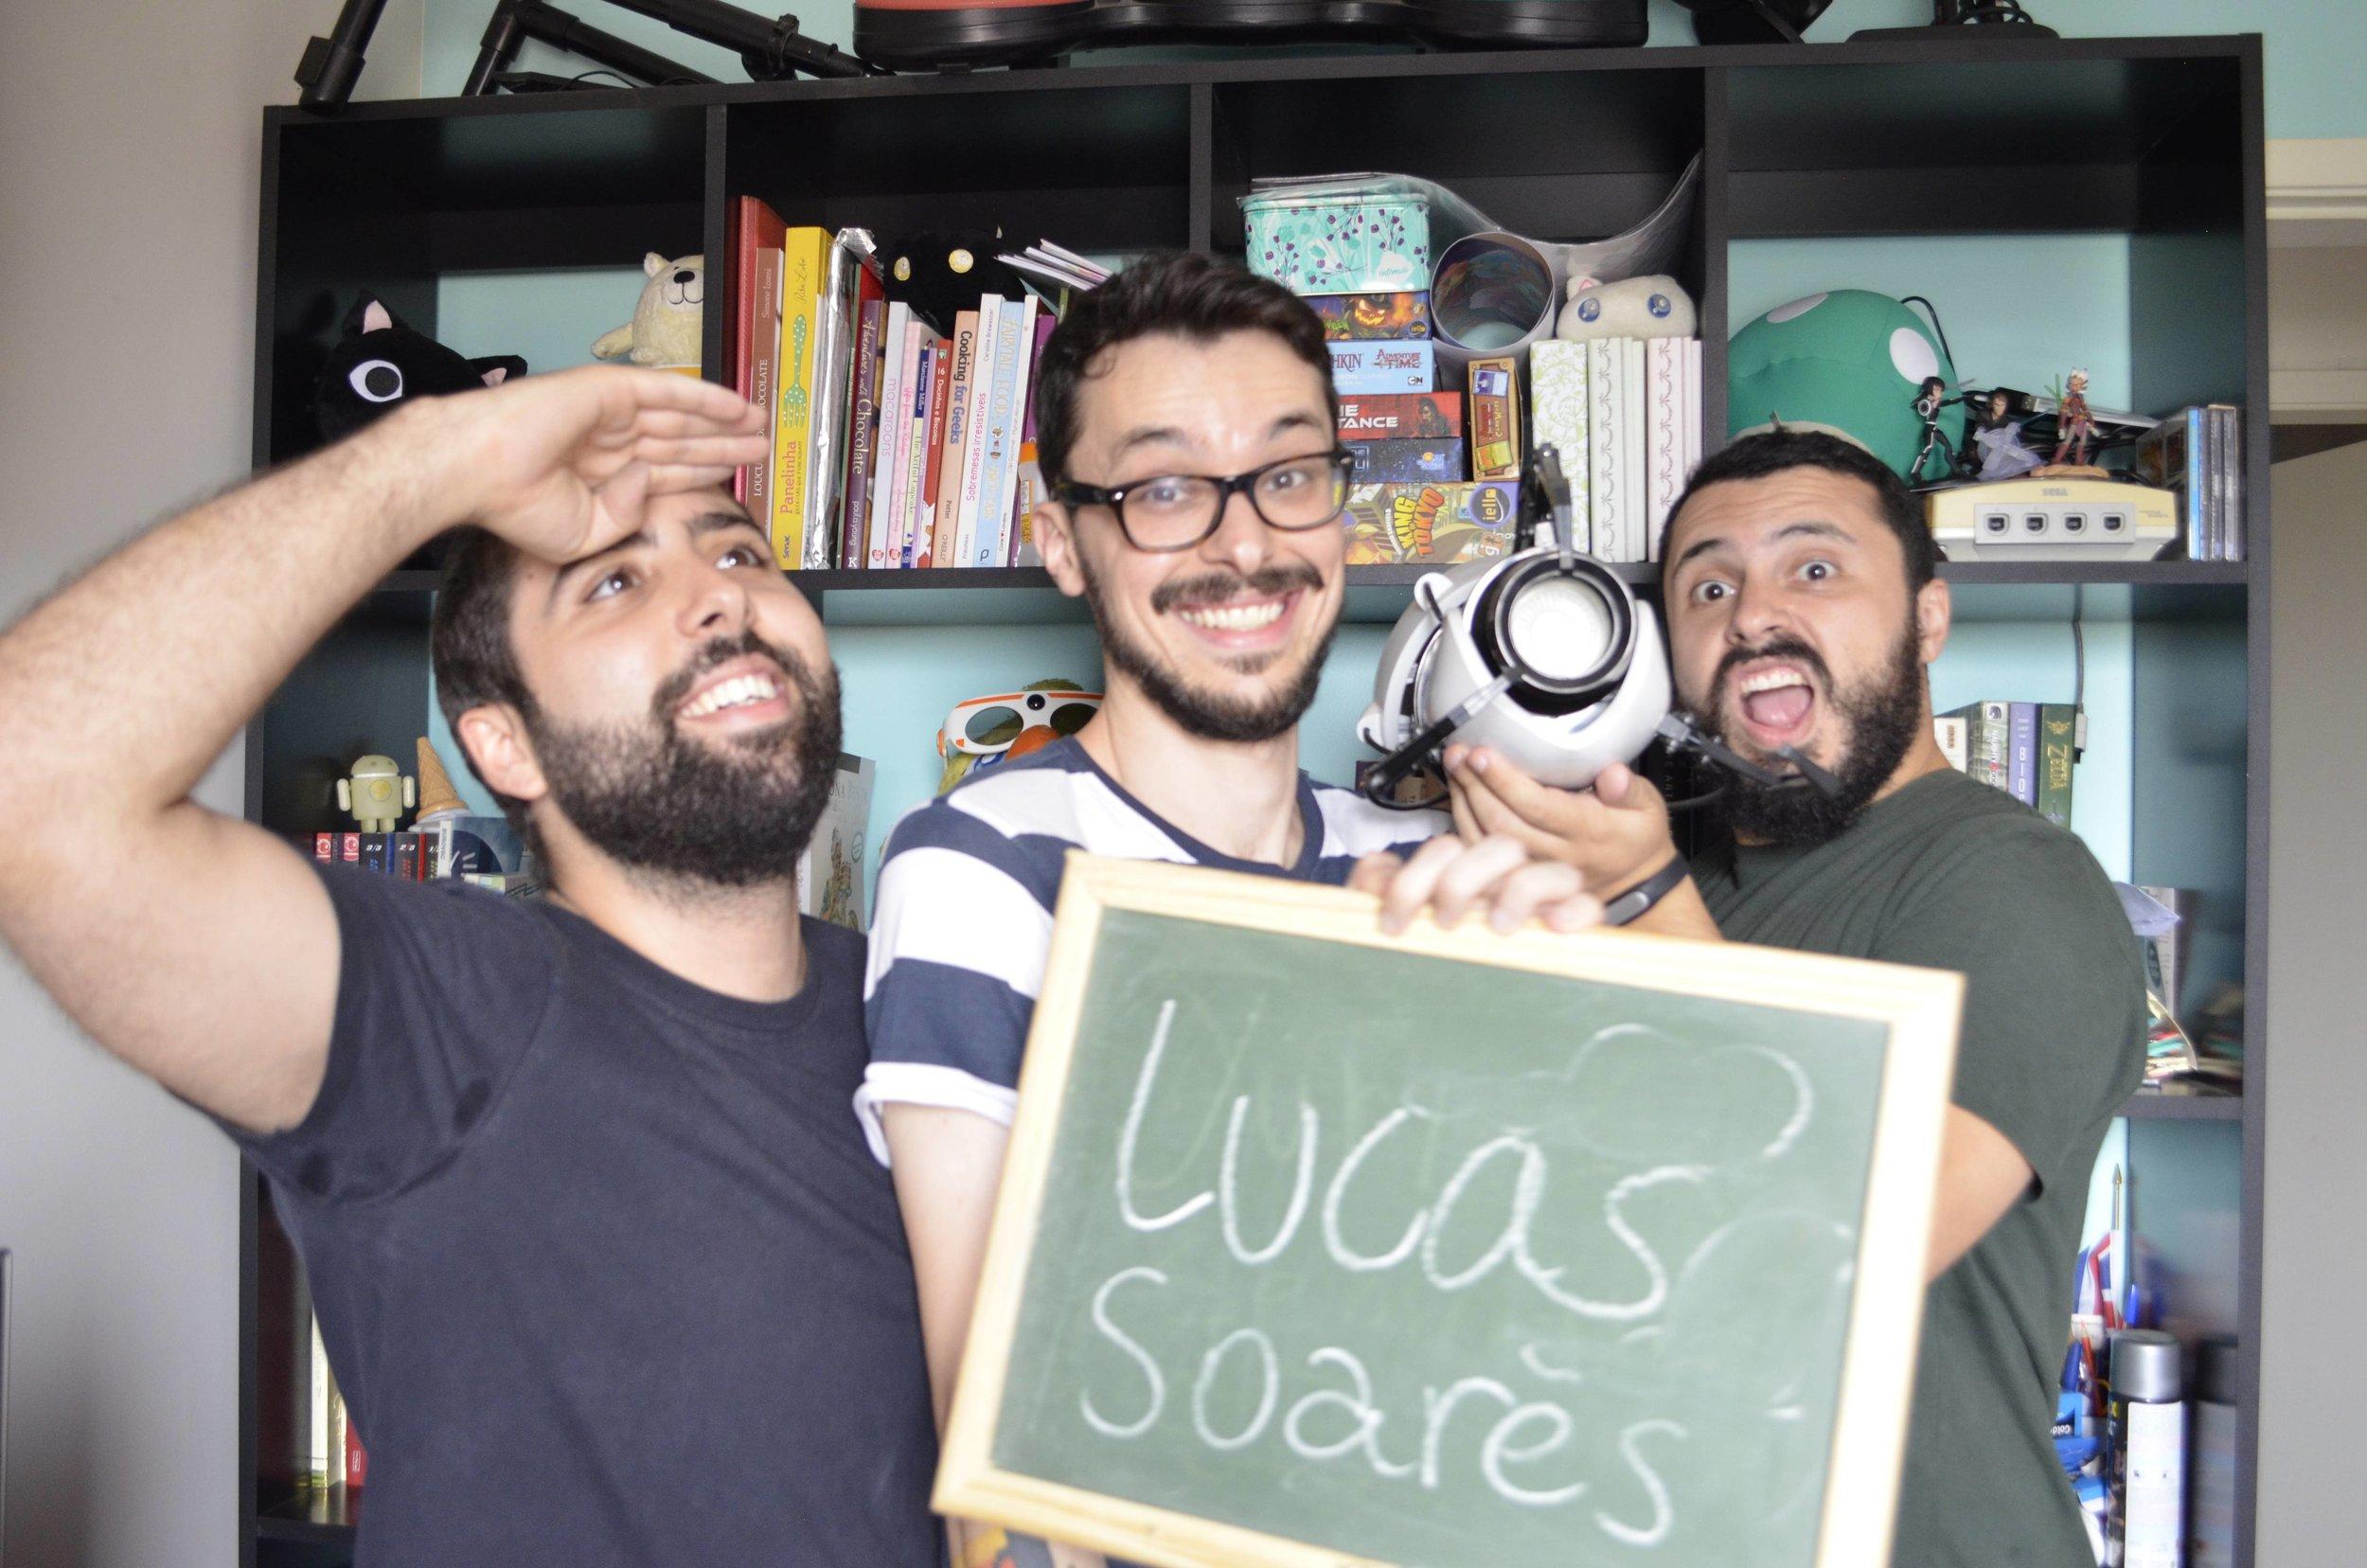 Lucas-Soares.jpg